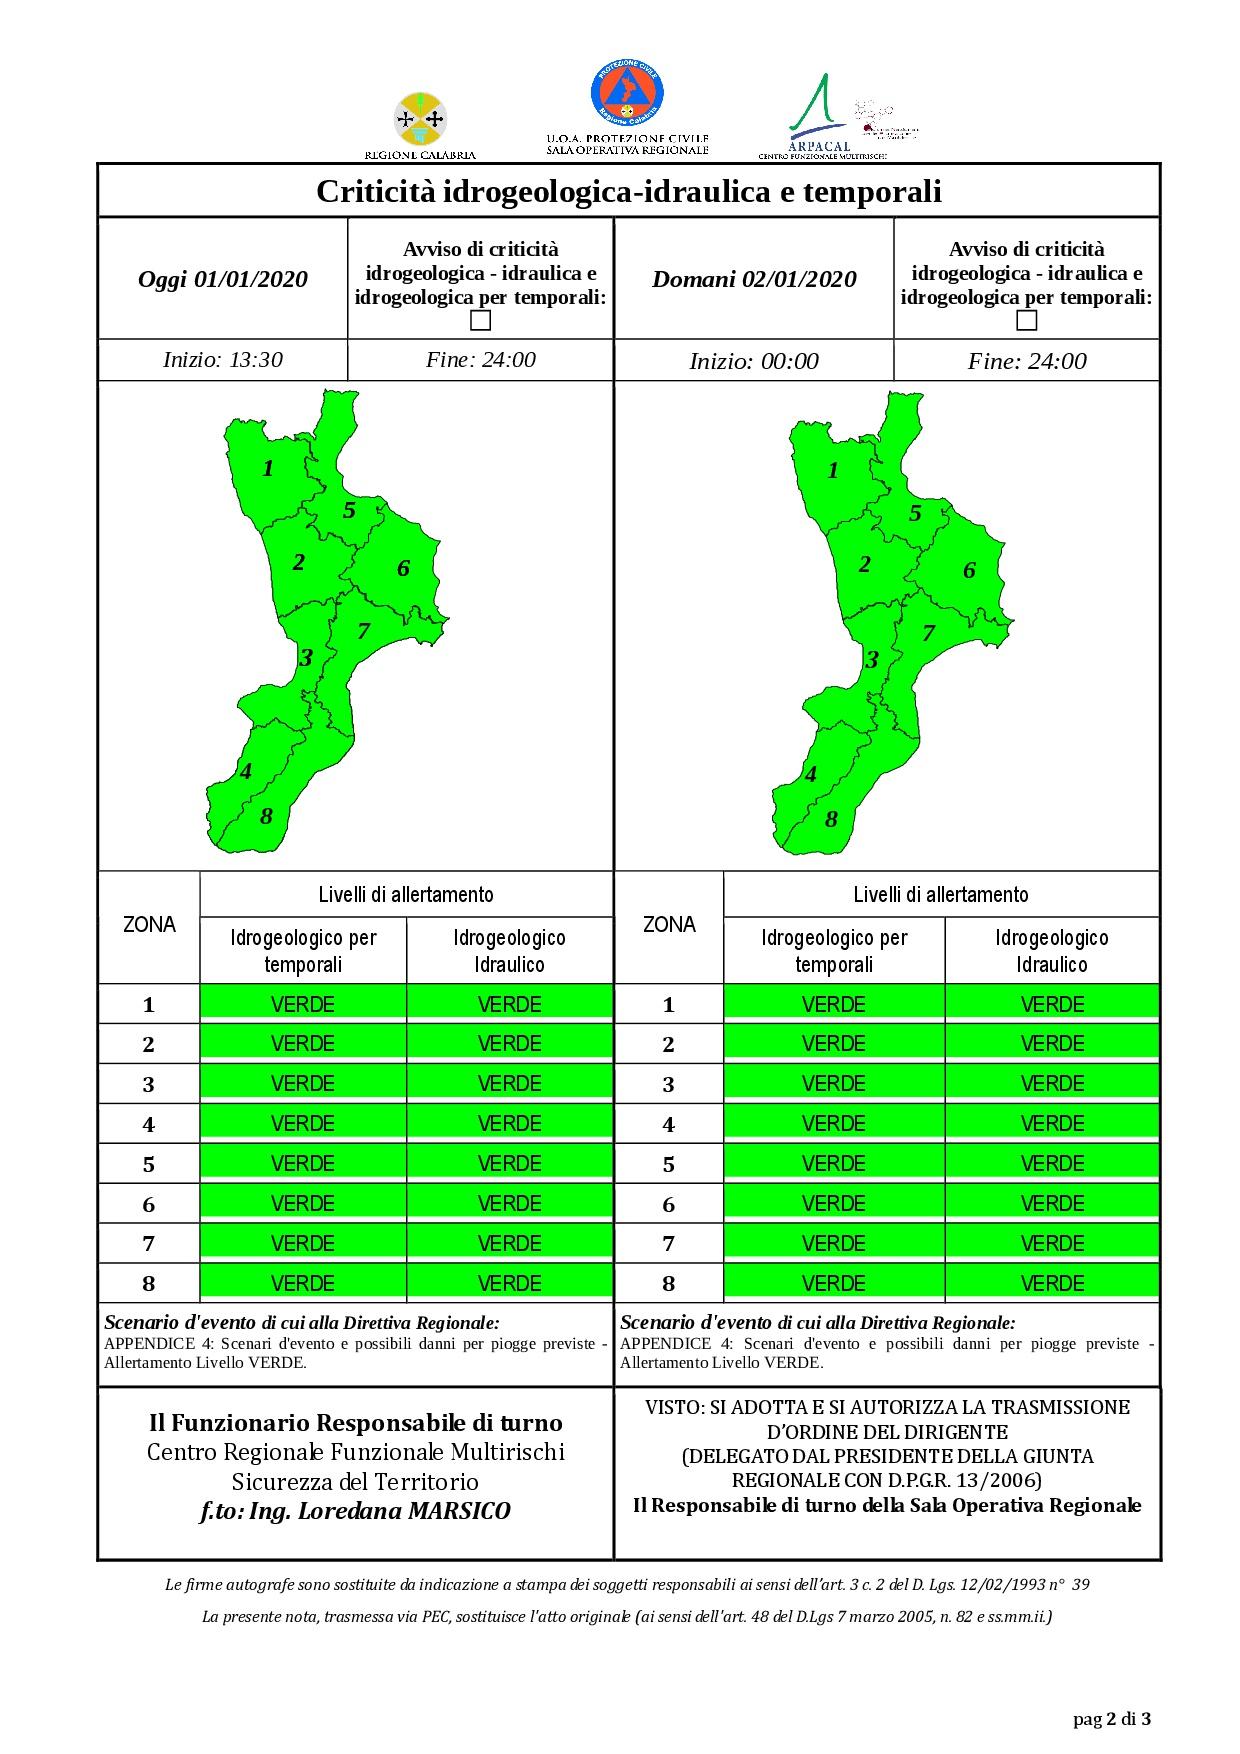 Criticità idrogeologica-idraulica e temporali in Calabria 01-01-2020